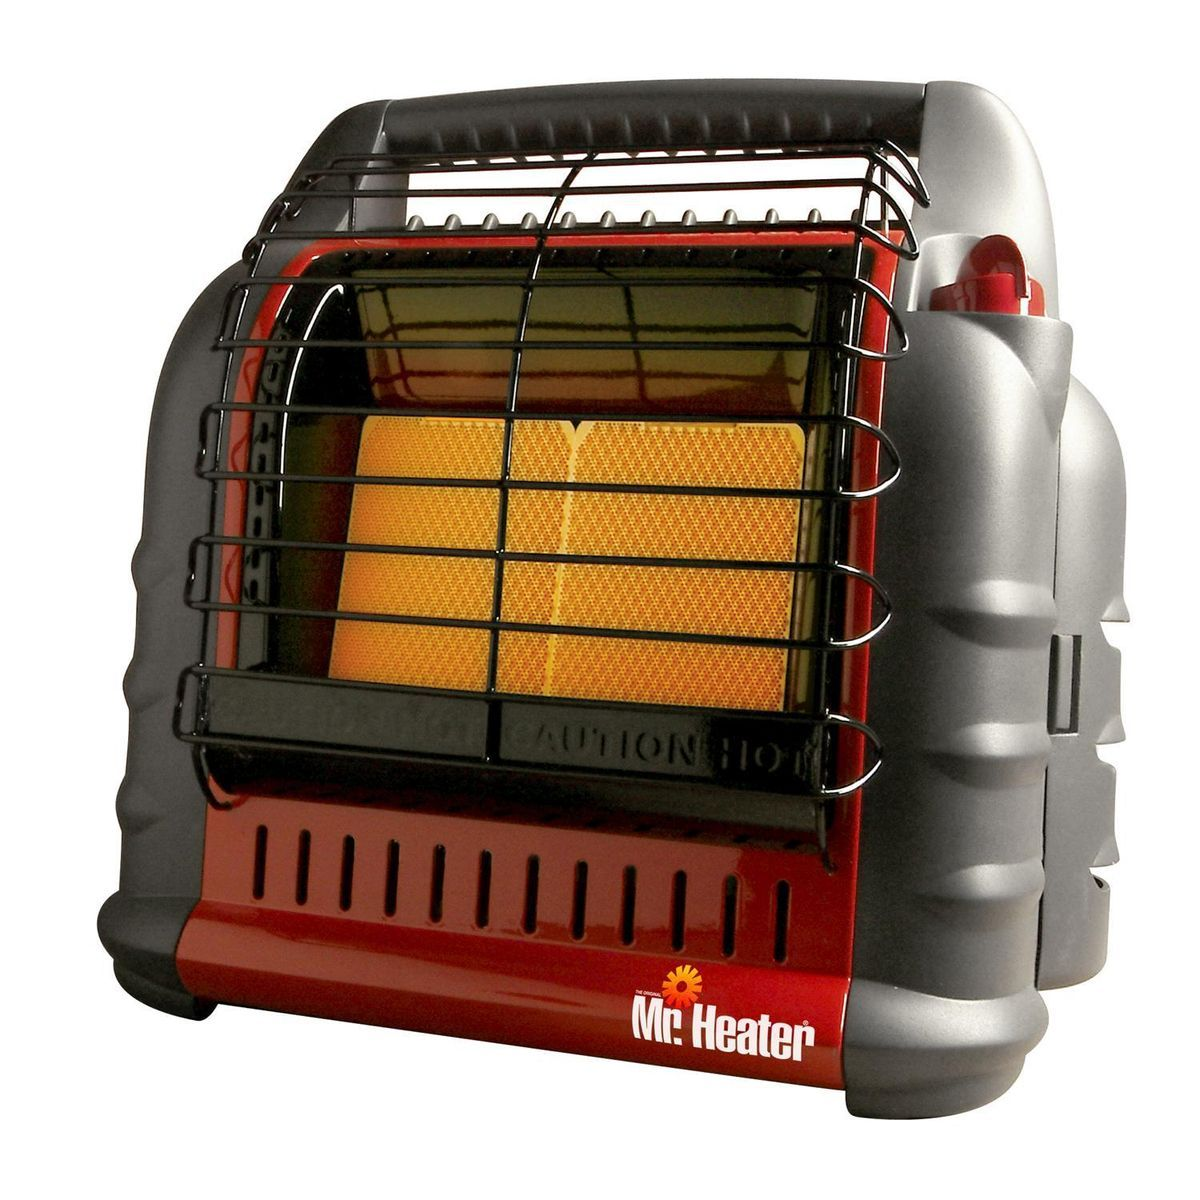 Mr Heater Big Buddy Indoor Propane Portable Emergency Heater